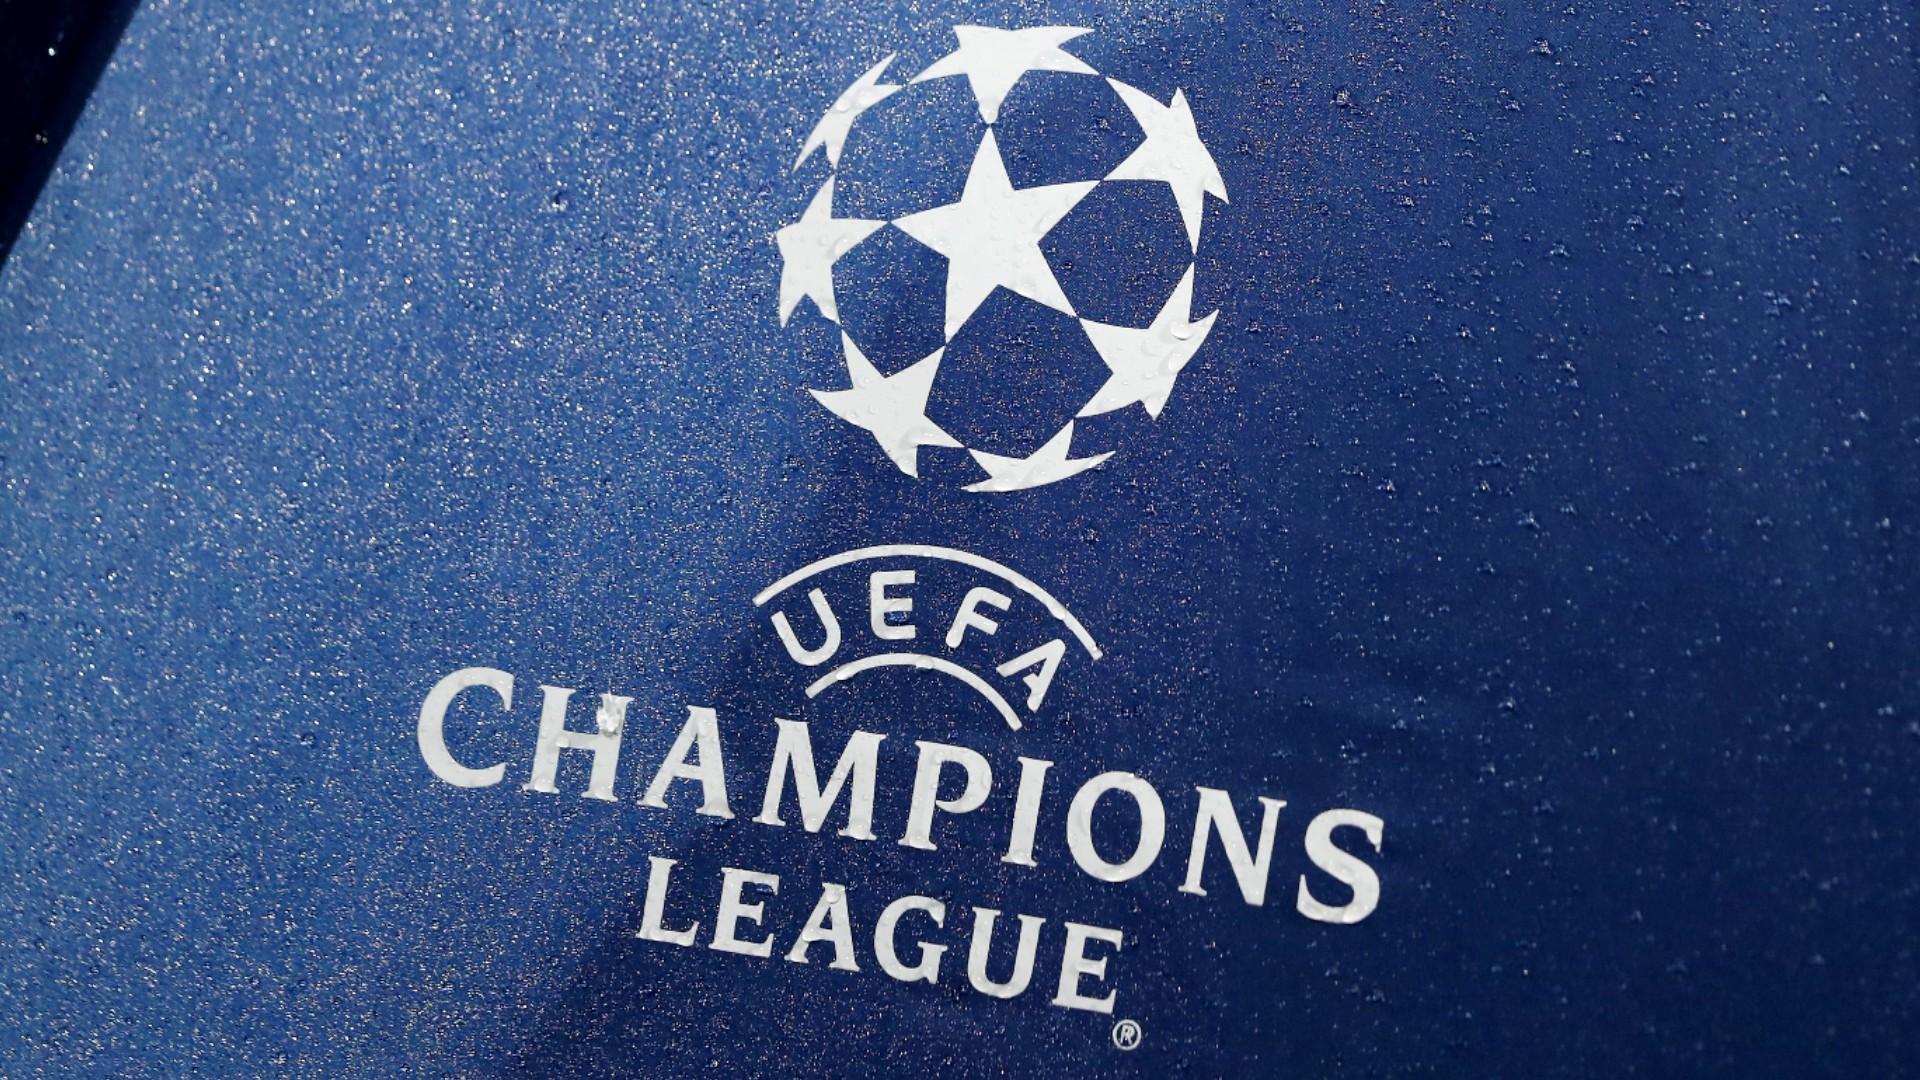 Uefa-champions-league-logo_1x0wuqpm5w9431p9vfrkz3qqu5